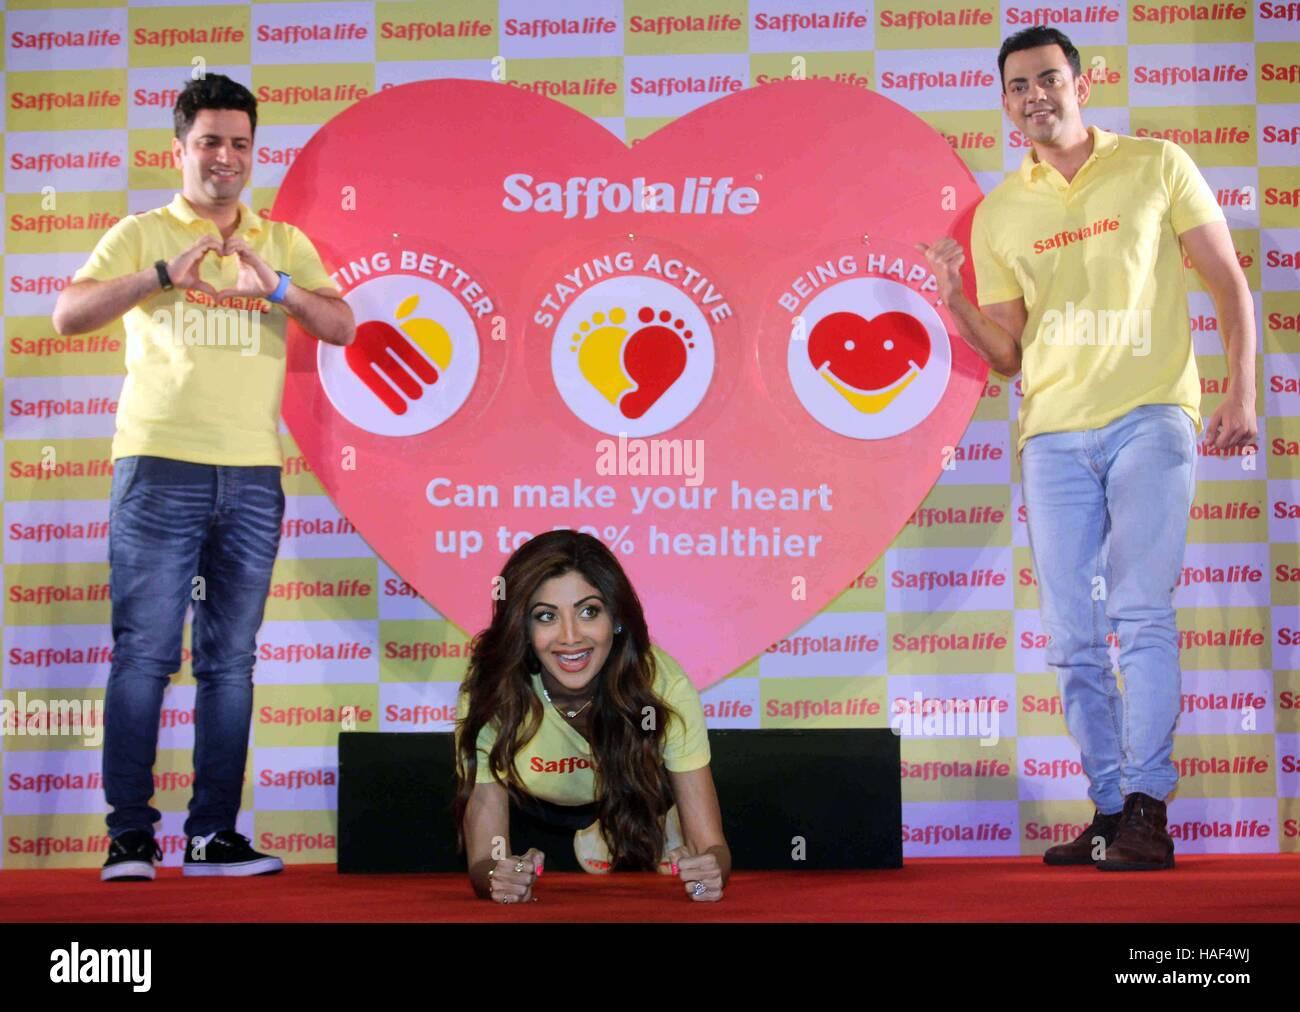 actor Shilpa Shetty displays fitness presence of Chef Kunal Kapur Cyrus Sahukar World Heart Day program organized - Stock Image